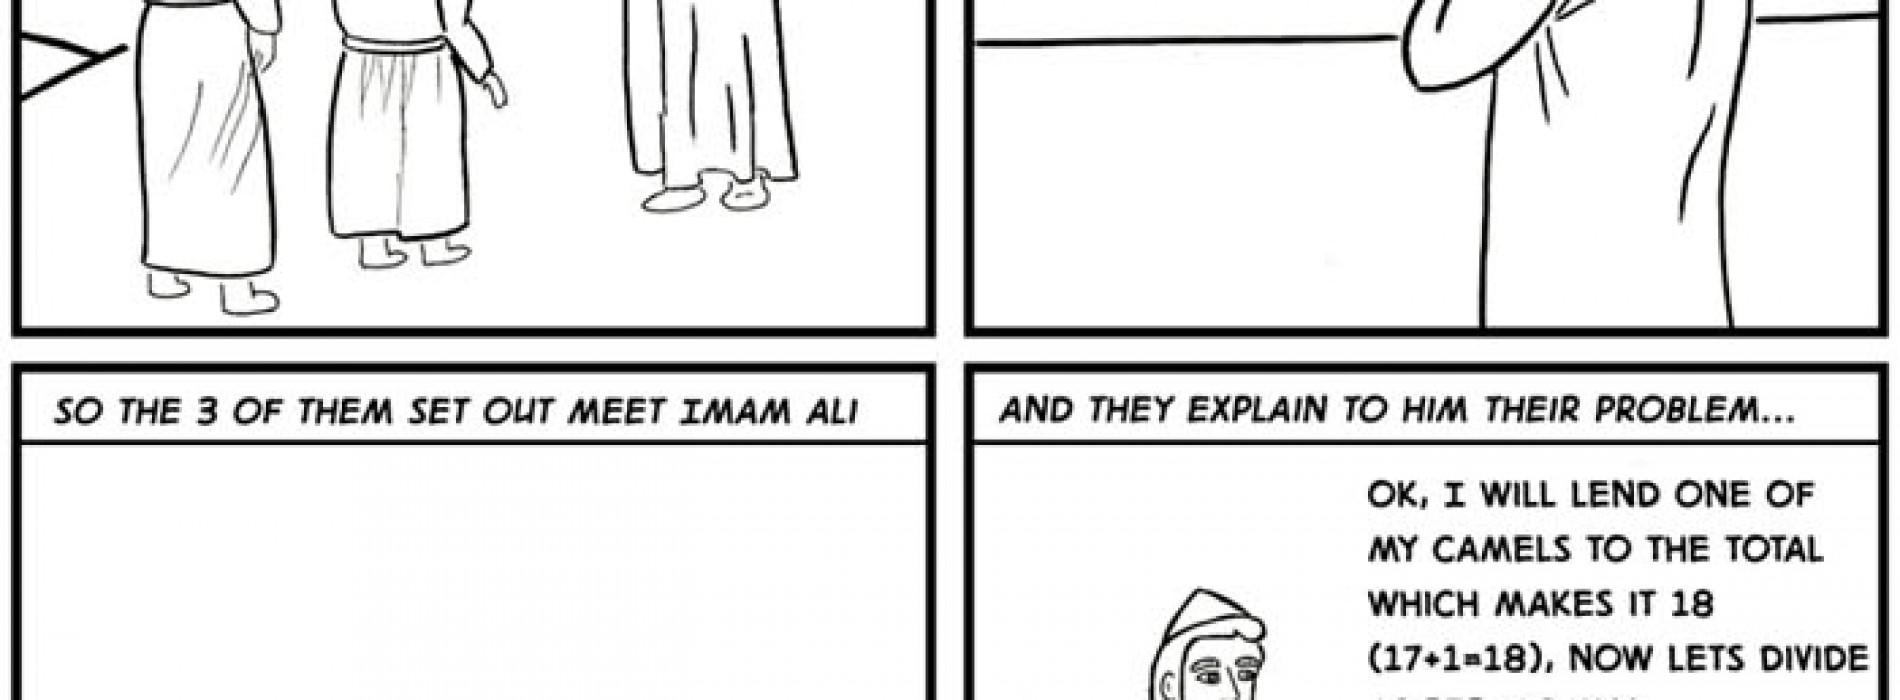 Dividing Seventeen Camels Between Three People